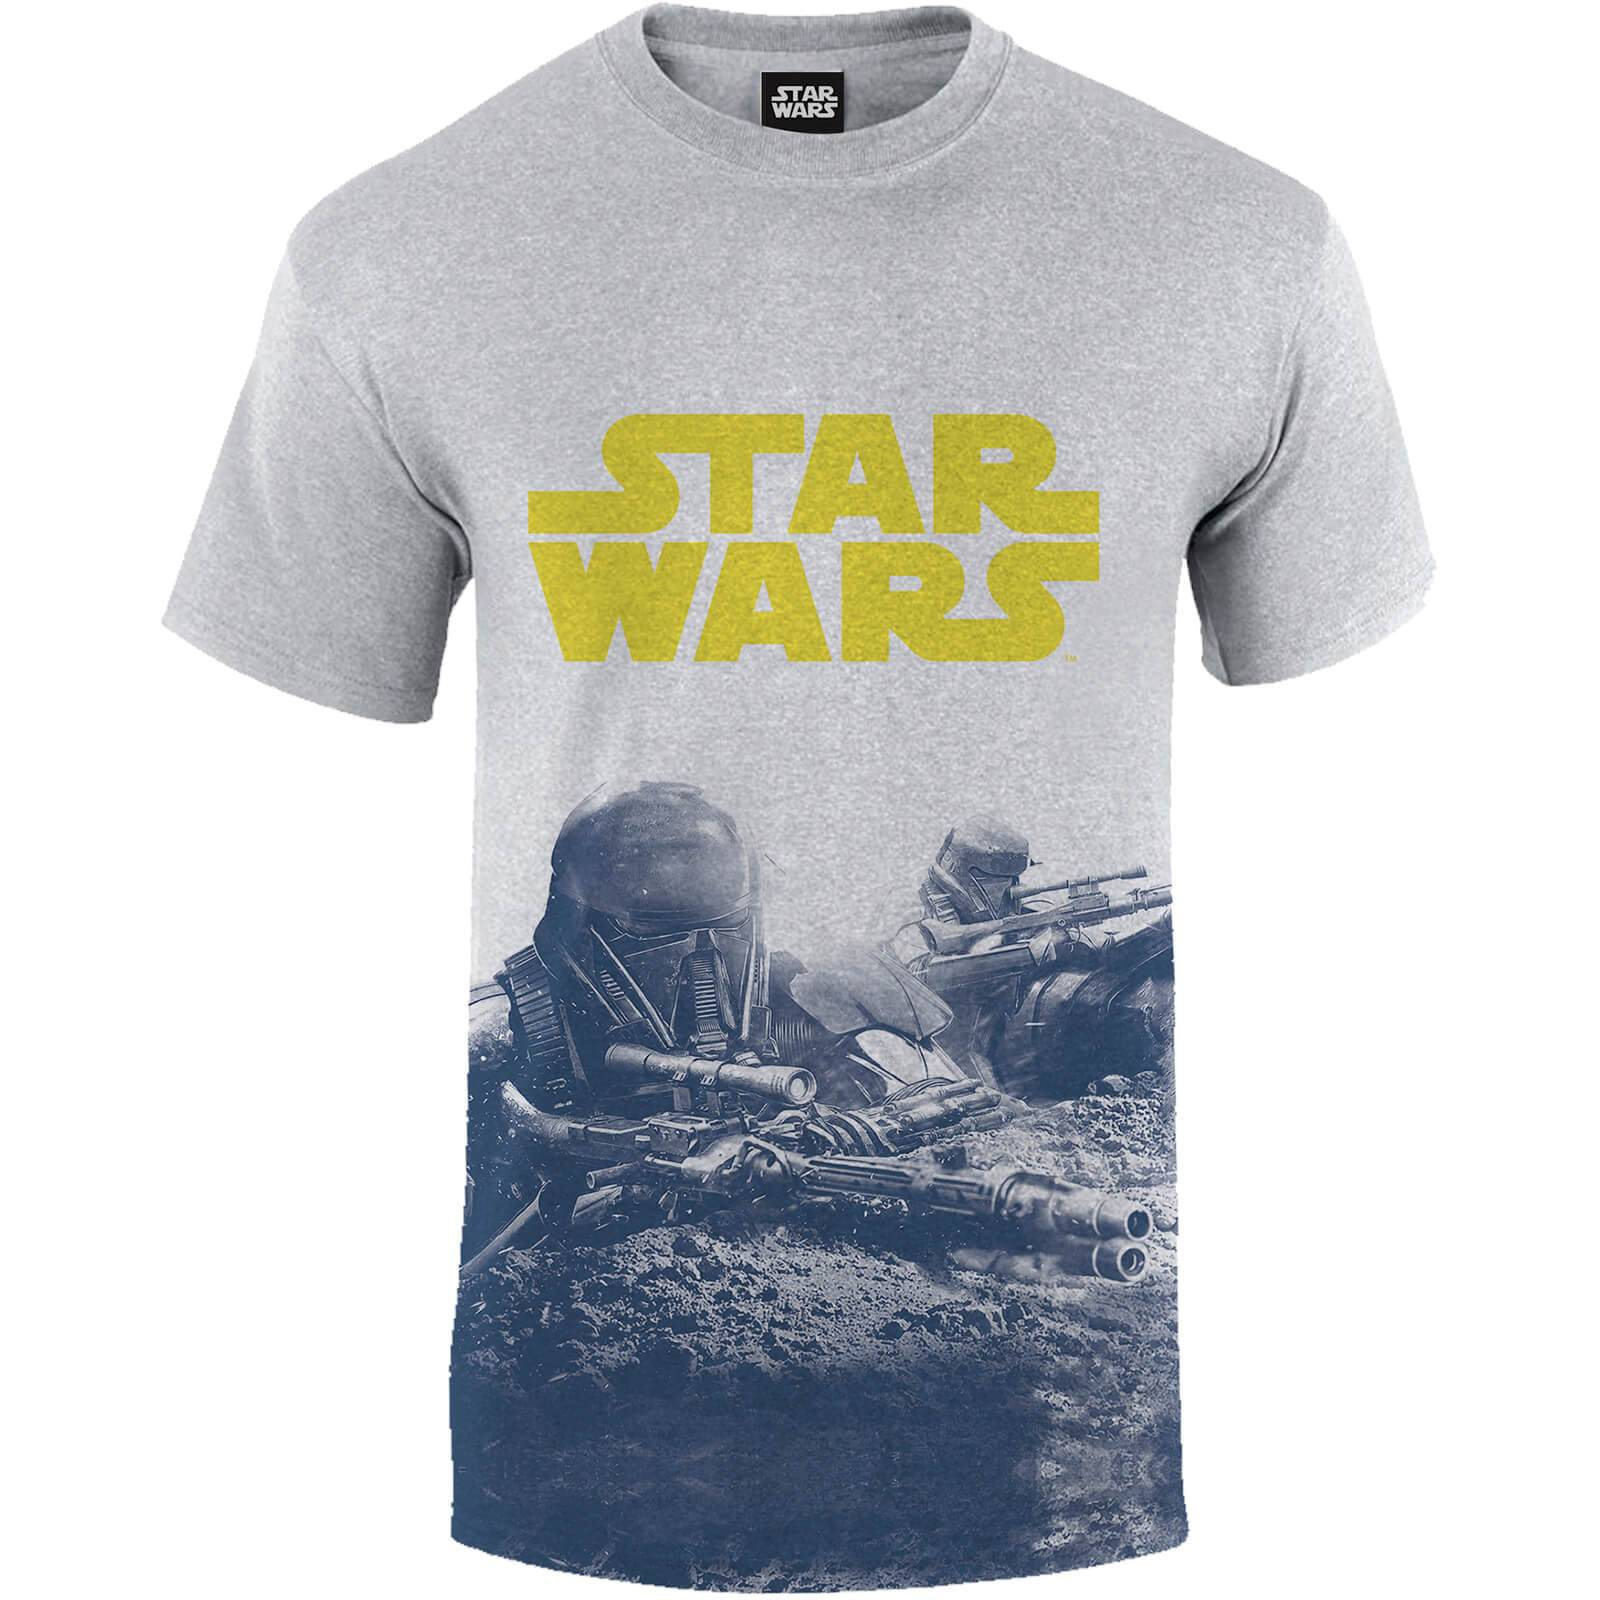 Geek Clothing Star Wars Rogue One Men's Blue Death Trooper Print T-Shirt - Grey - XXL - Grey